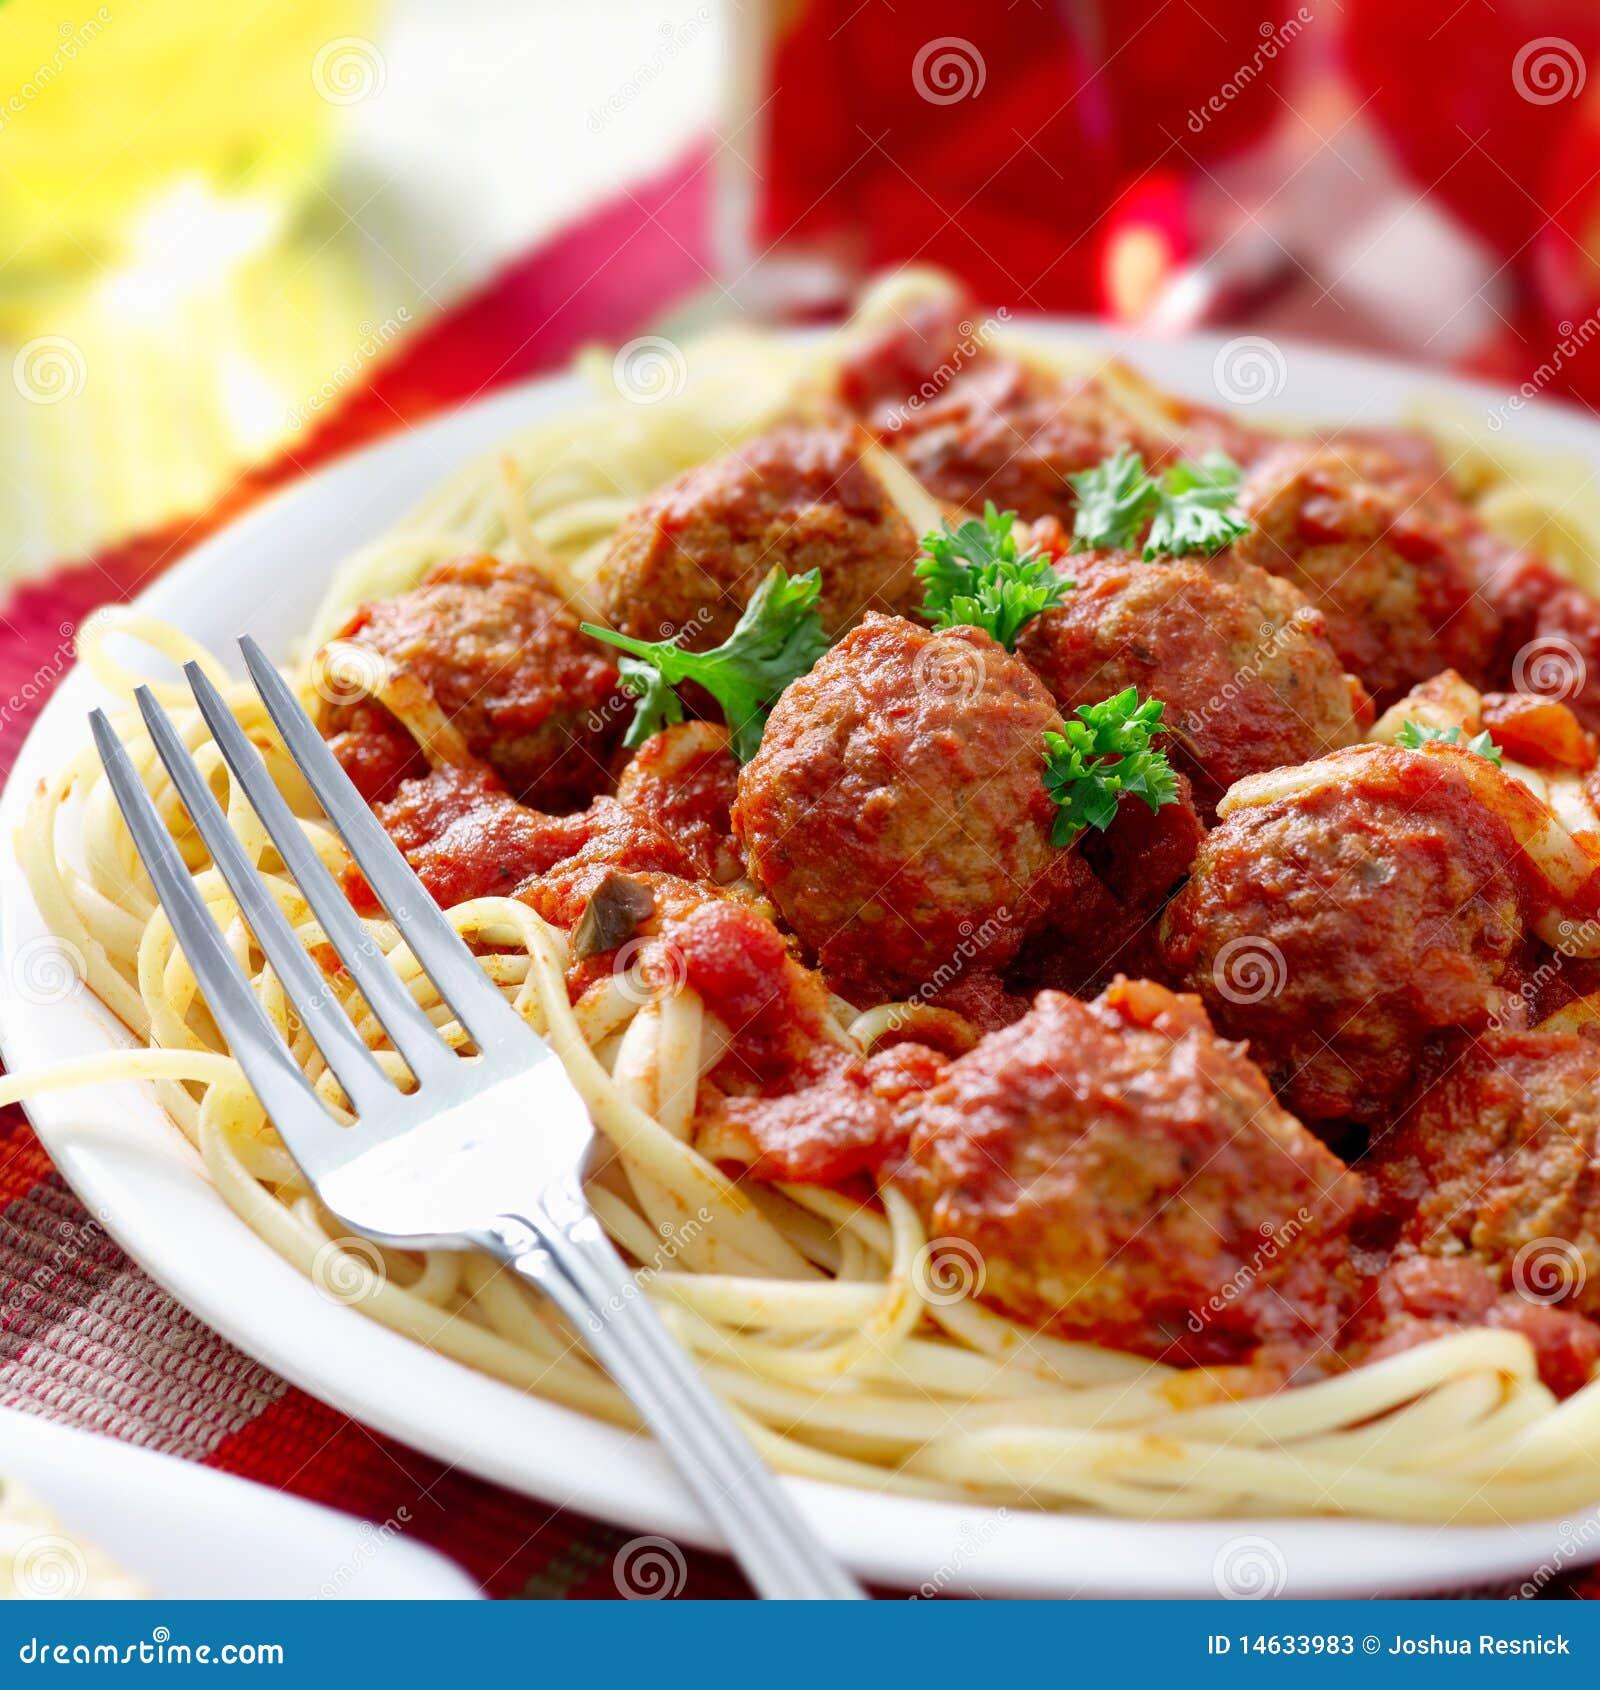 Barefoot Contessa Italian Recipes Spaghetti And Meatball Dinner Stock Image Image Of